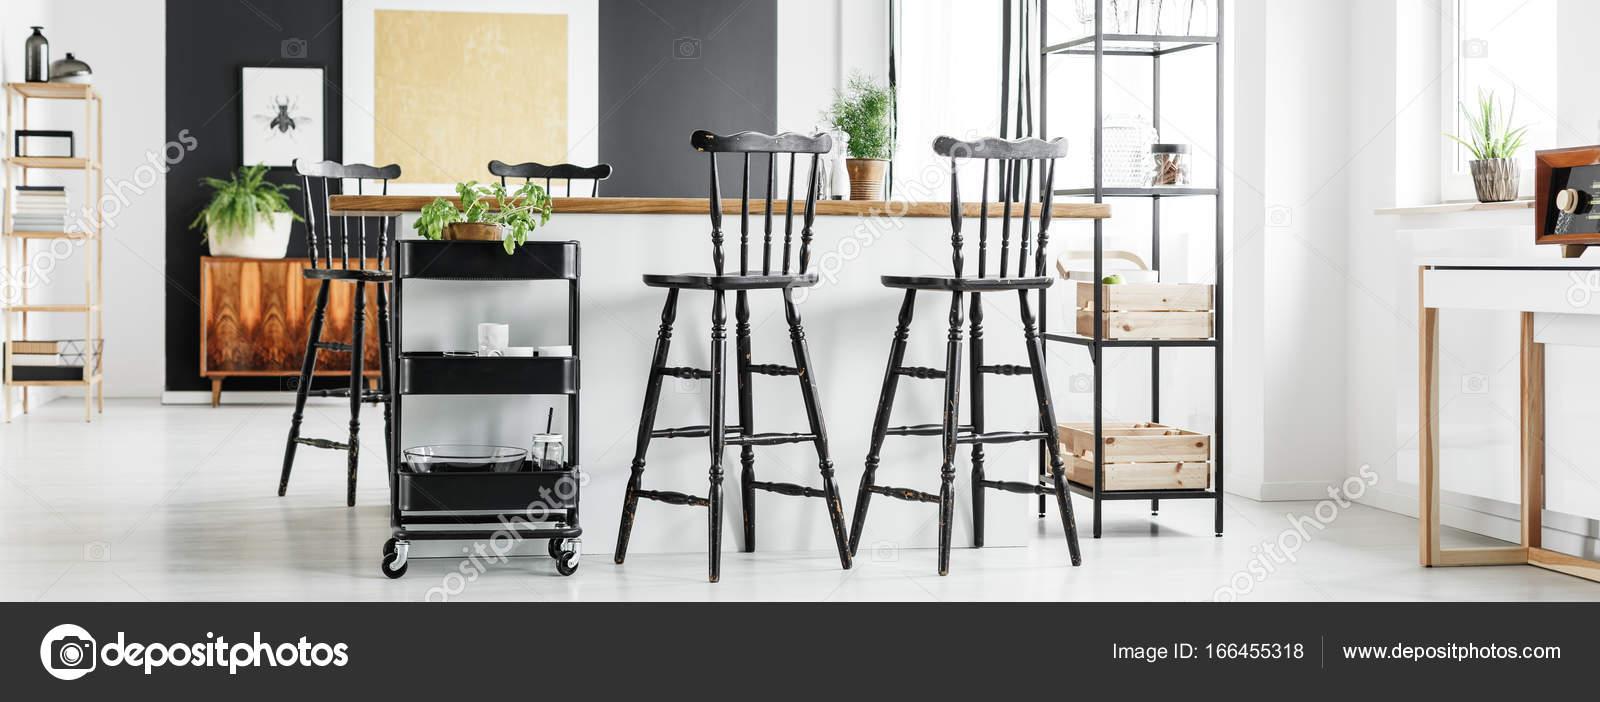 https://st3.depositphotos.com/2249091/16645/i/1600/depositphotos_166455318-stock-photo-modern-shabby-chic-loft-interior.jpg